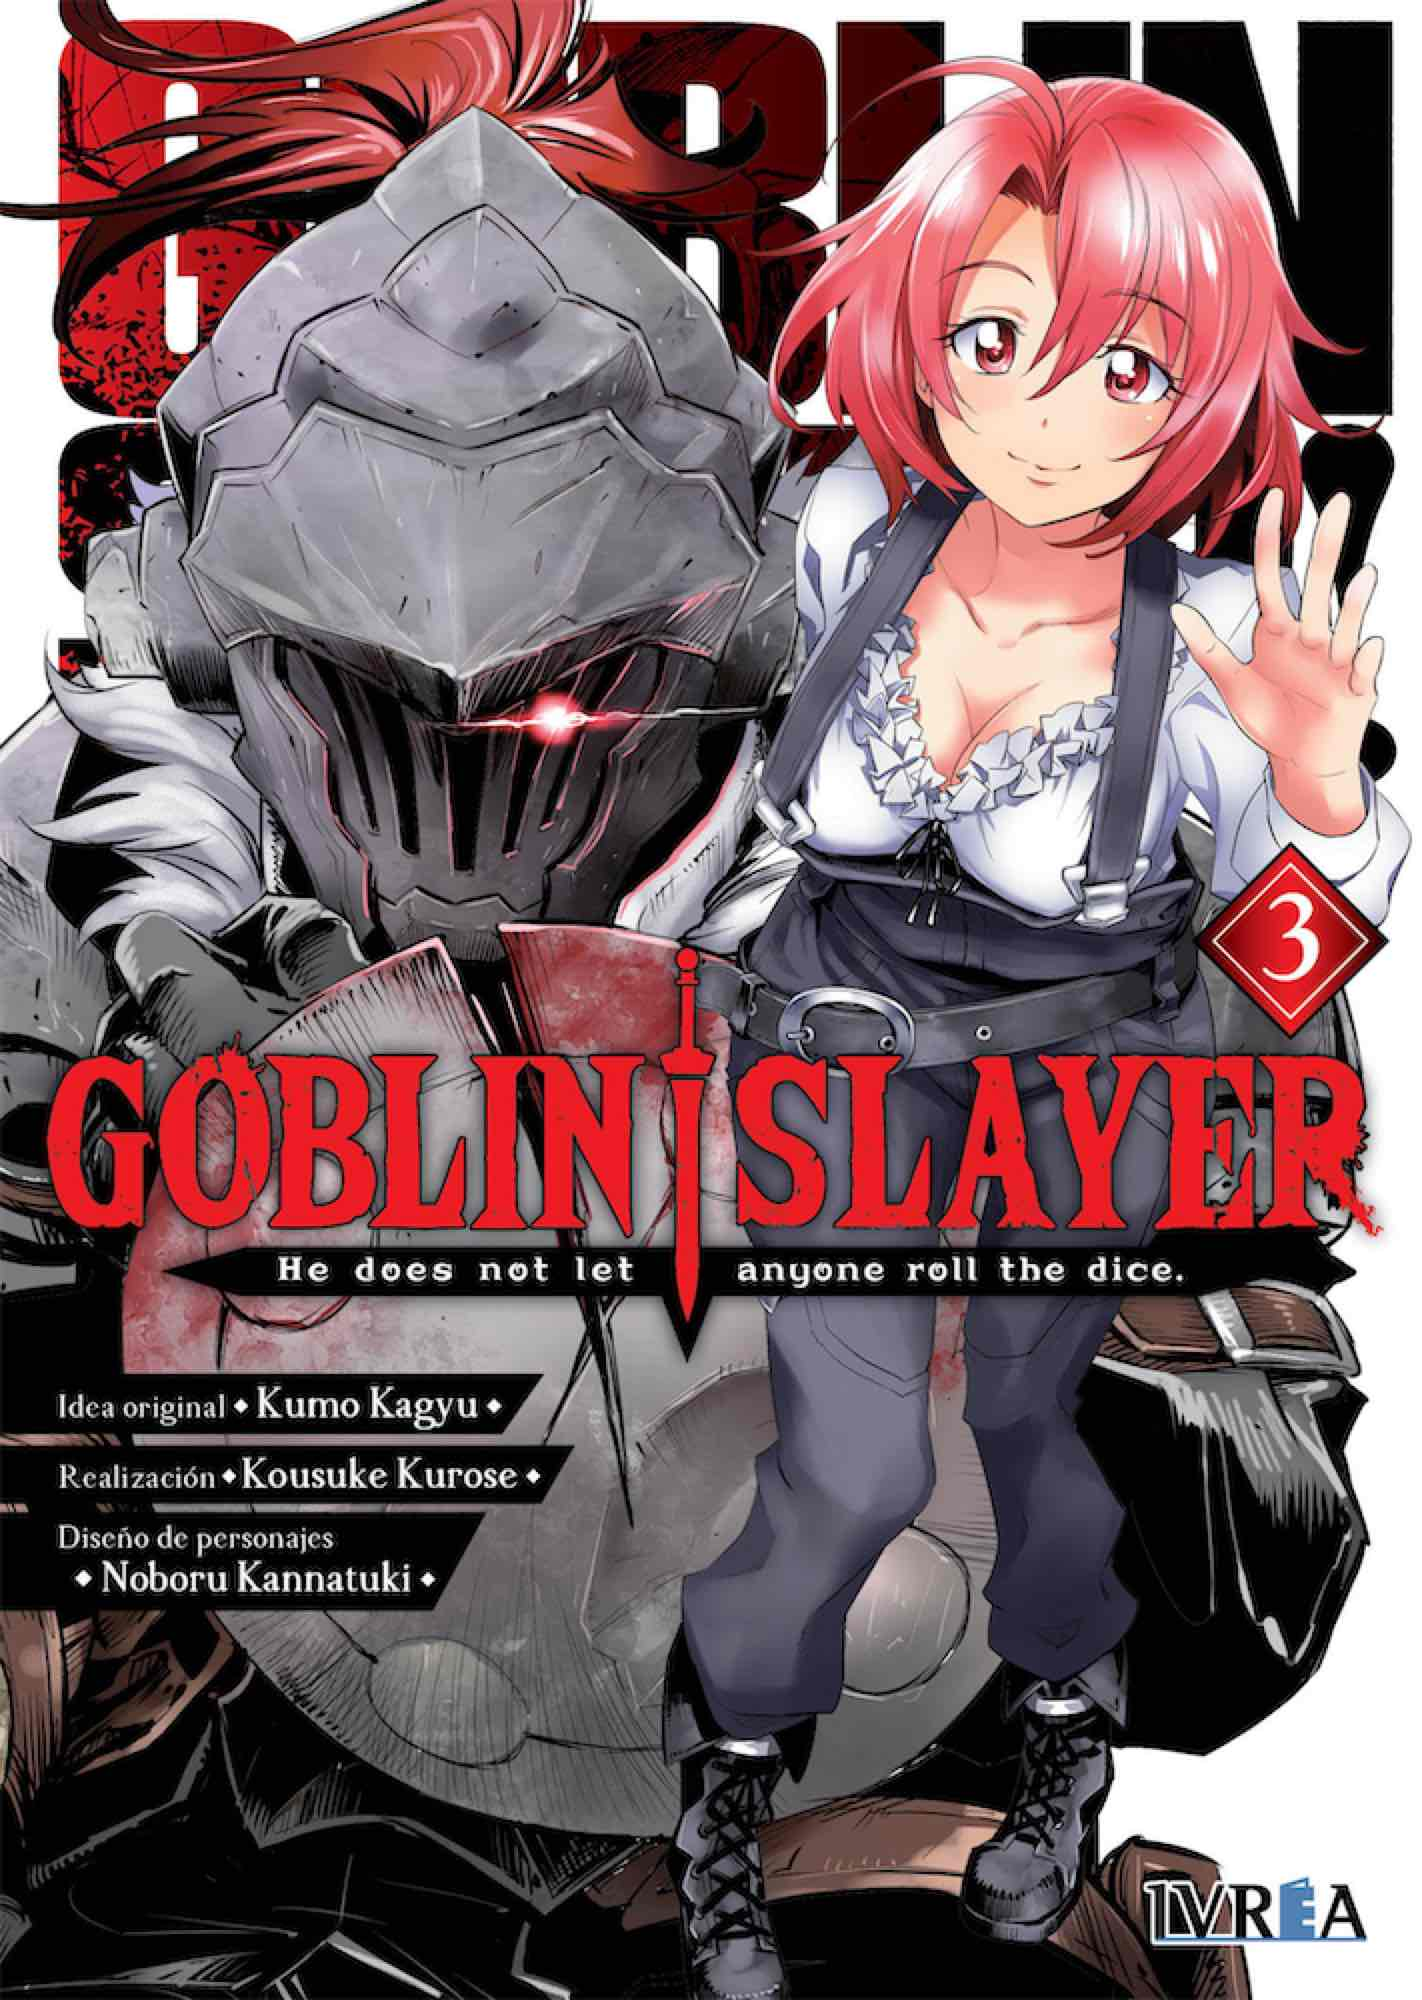 Goblin Slayer manga 3